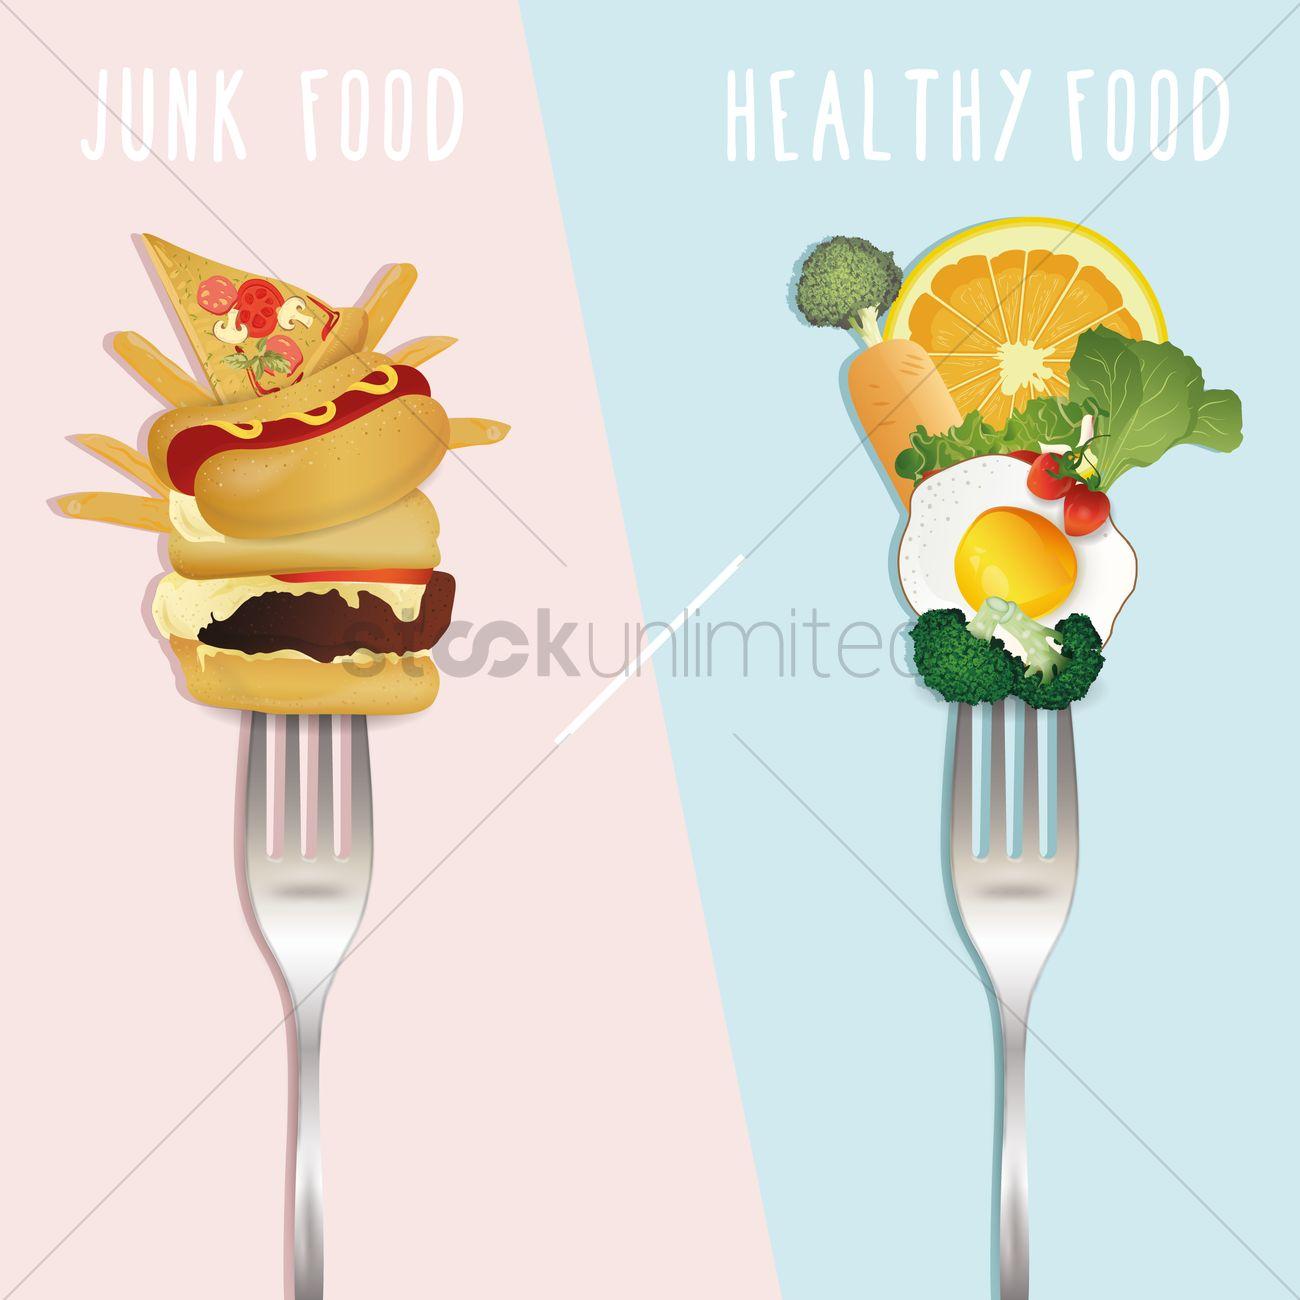 Healthy Junk Food Pictures